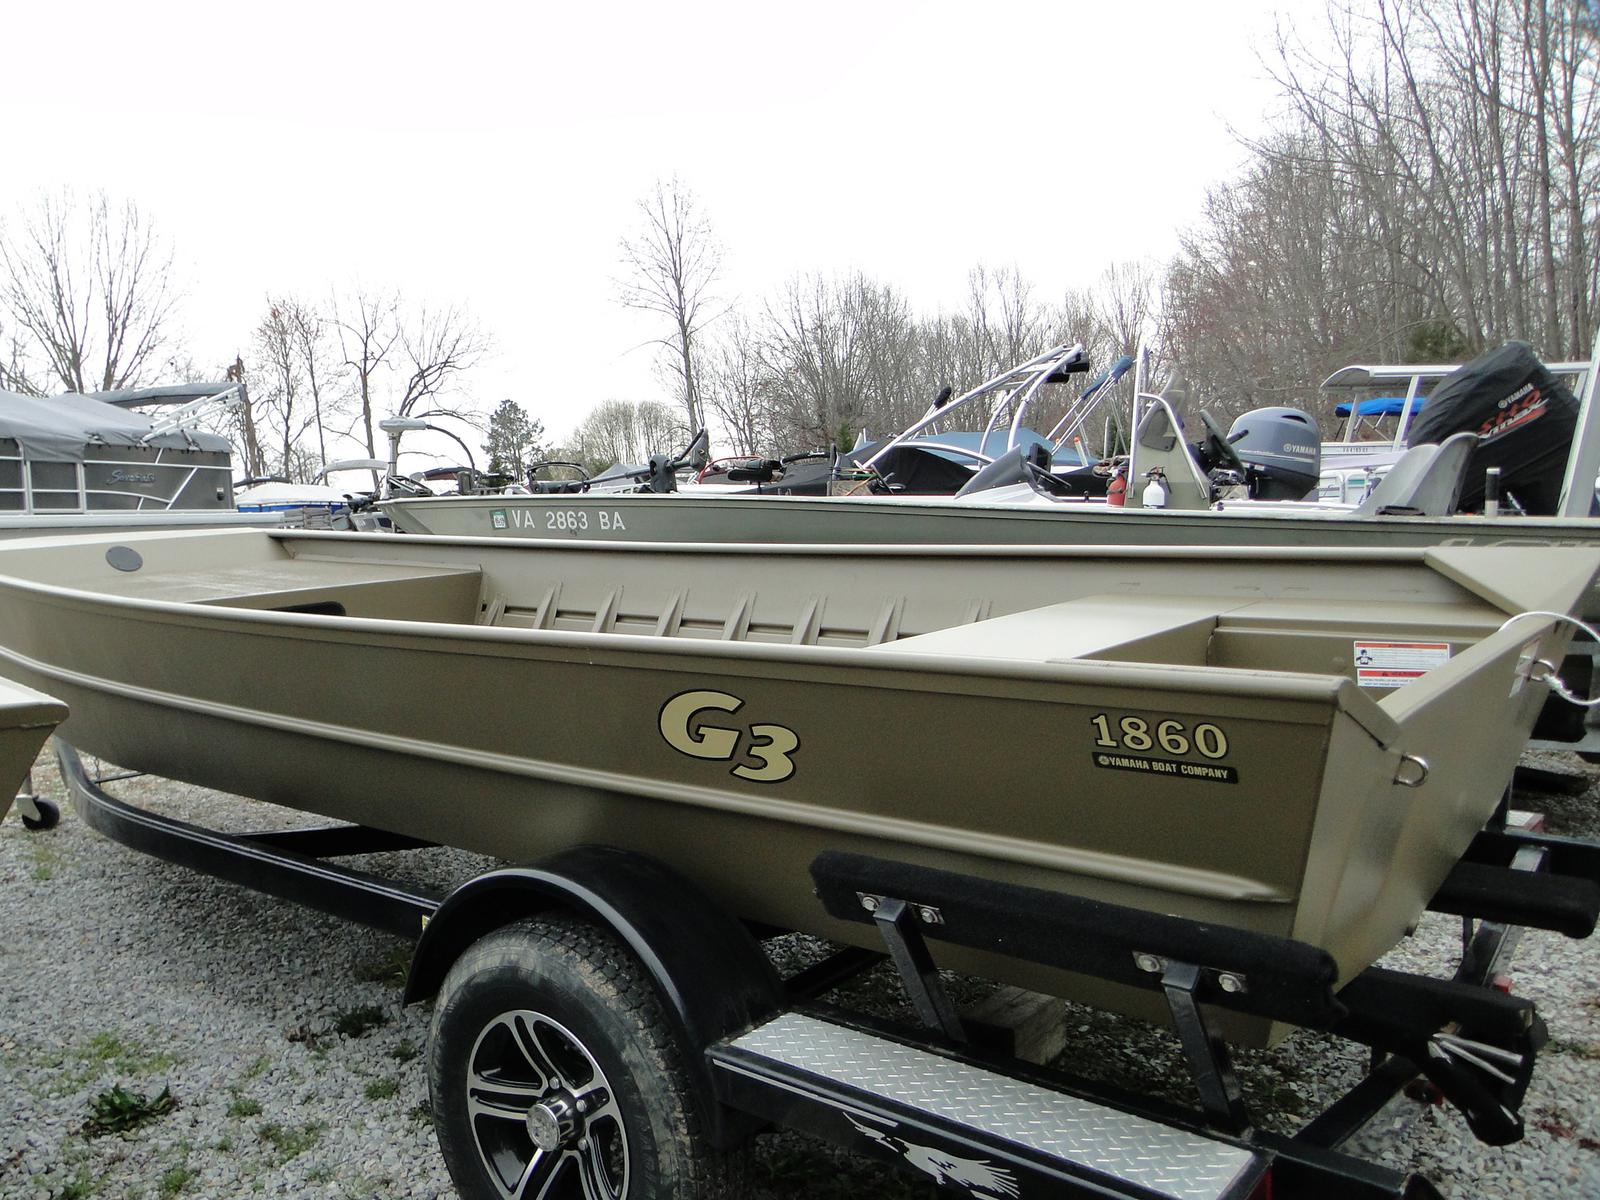 In-Stock New and Used Models For Sale in Danville, VA